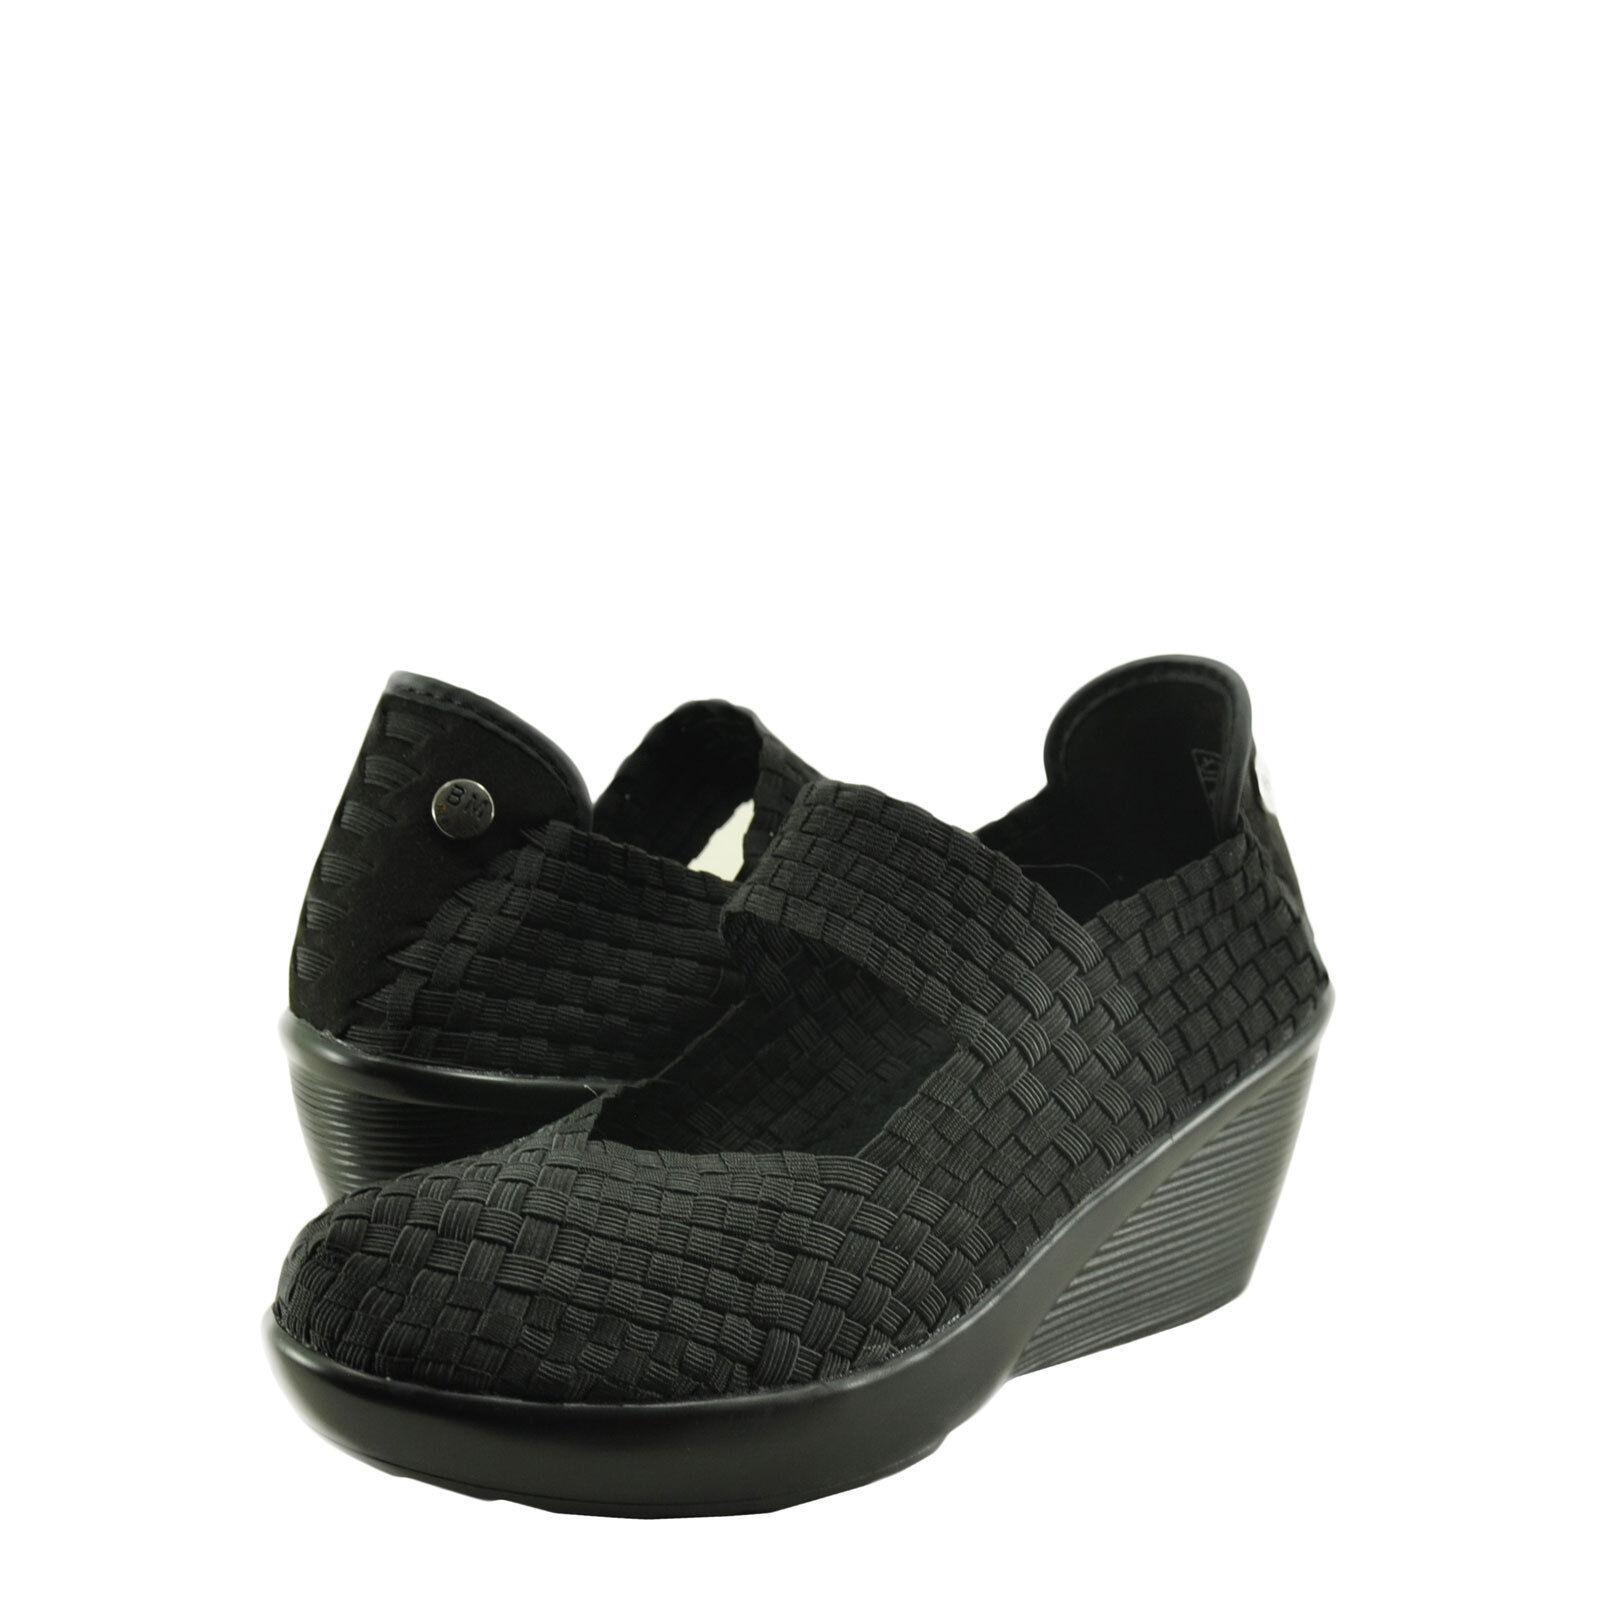 Wouomo scarpe Bernie Mev. Fresh Lulia Handwoven Casual Wedges nero New